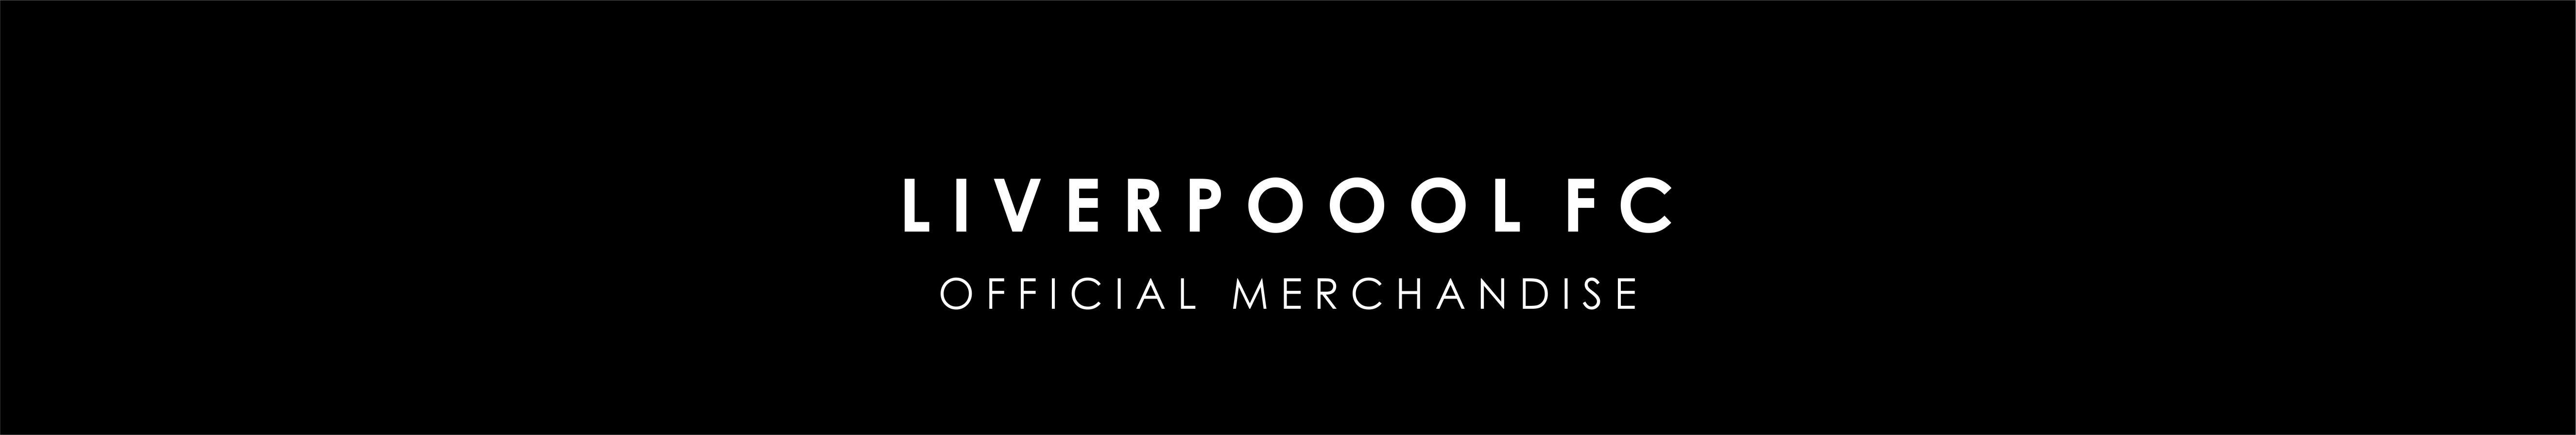 liverpool-fc-banner.jpg